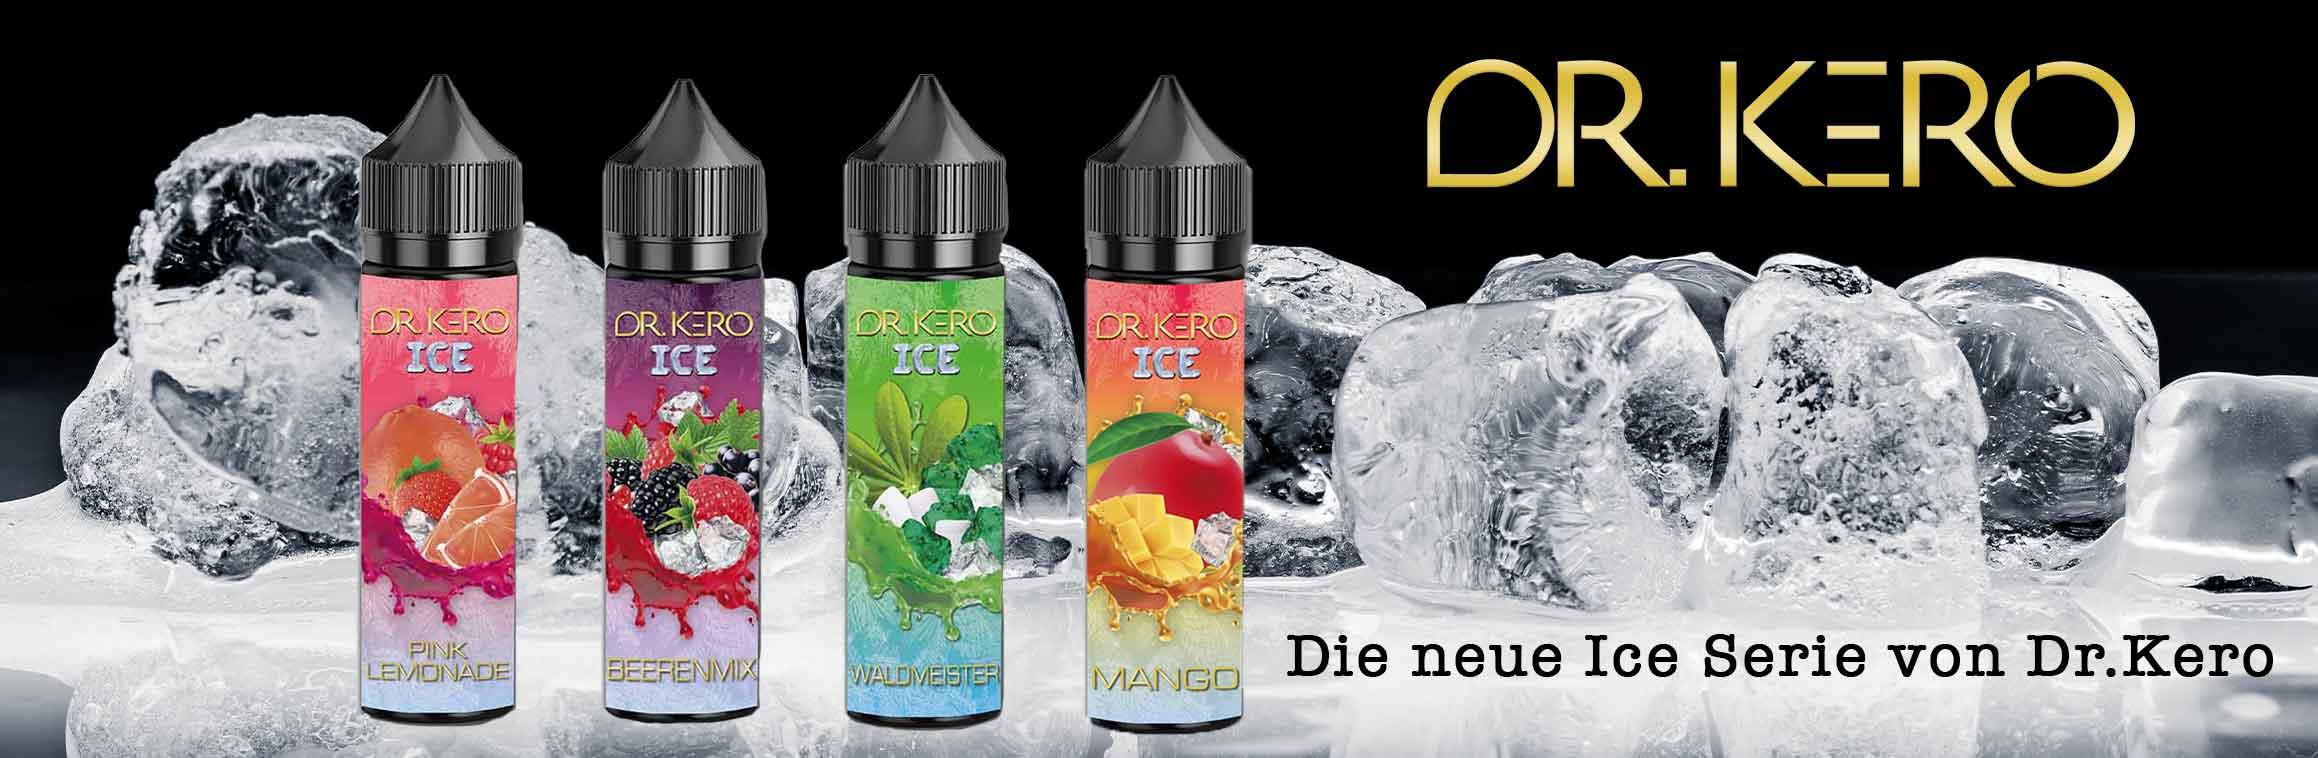 Dr-Kero-ICE-Banner-WEBcgBdQNmXYtGRb